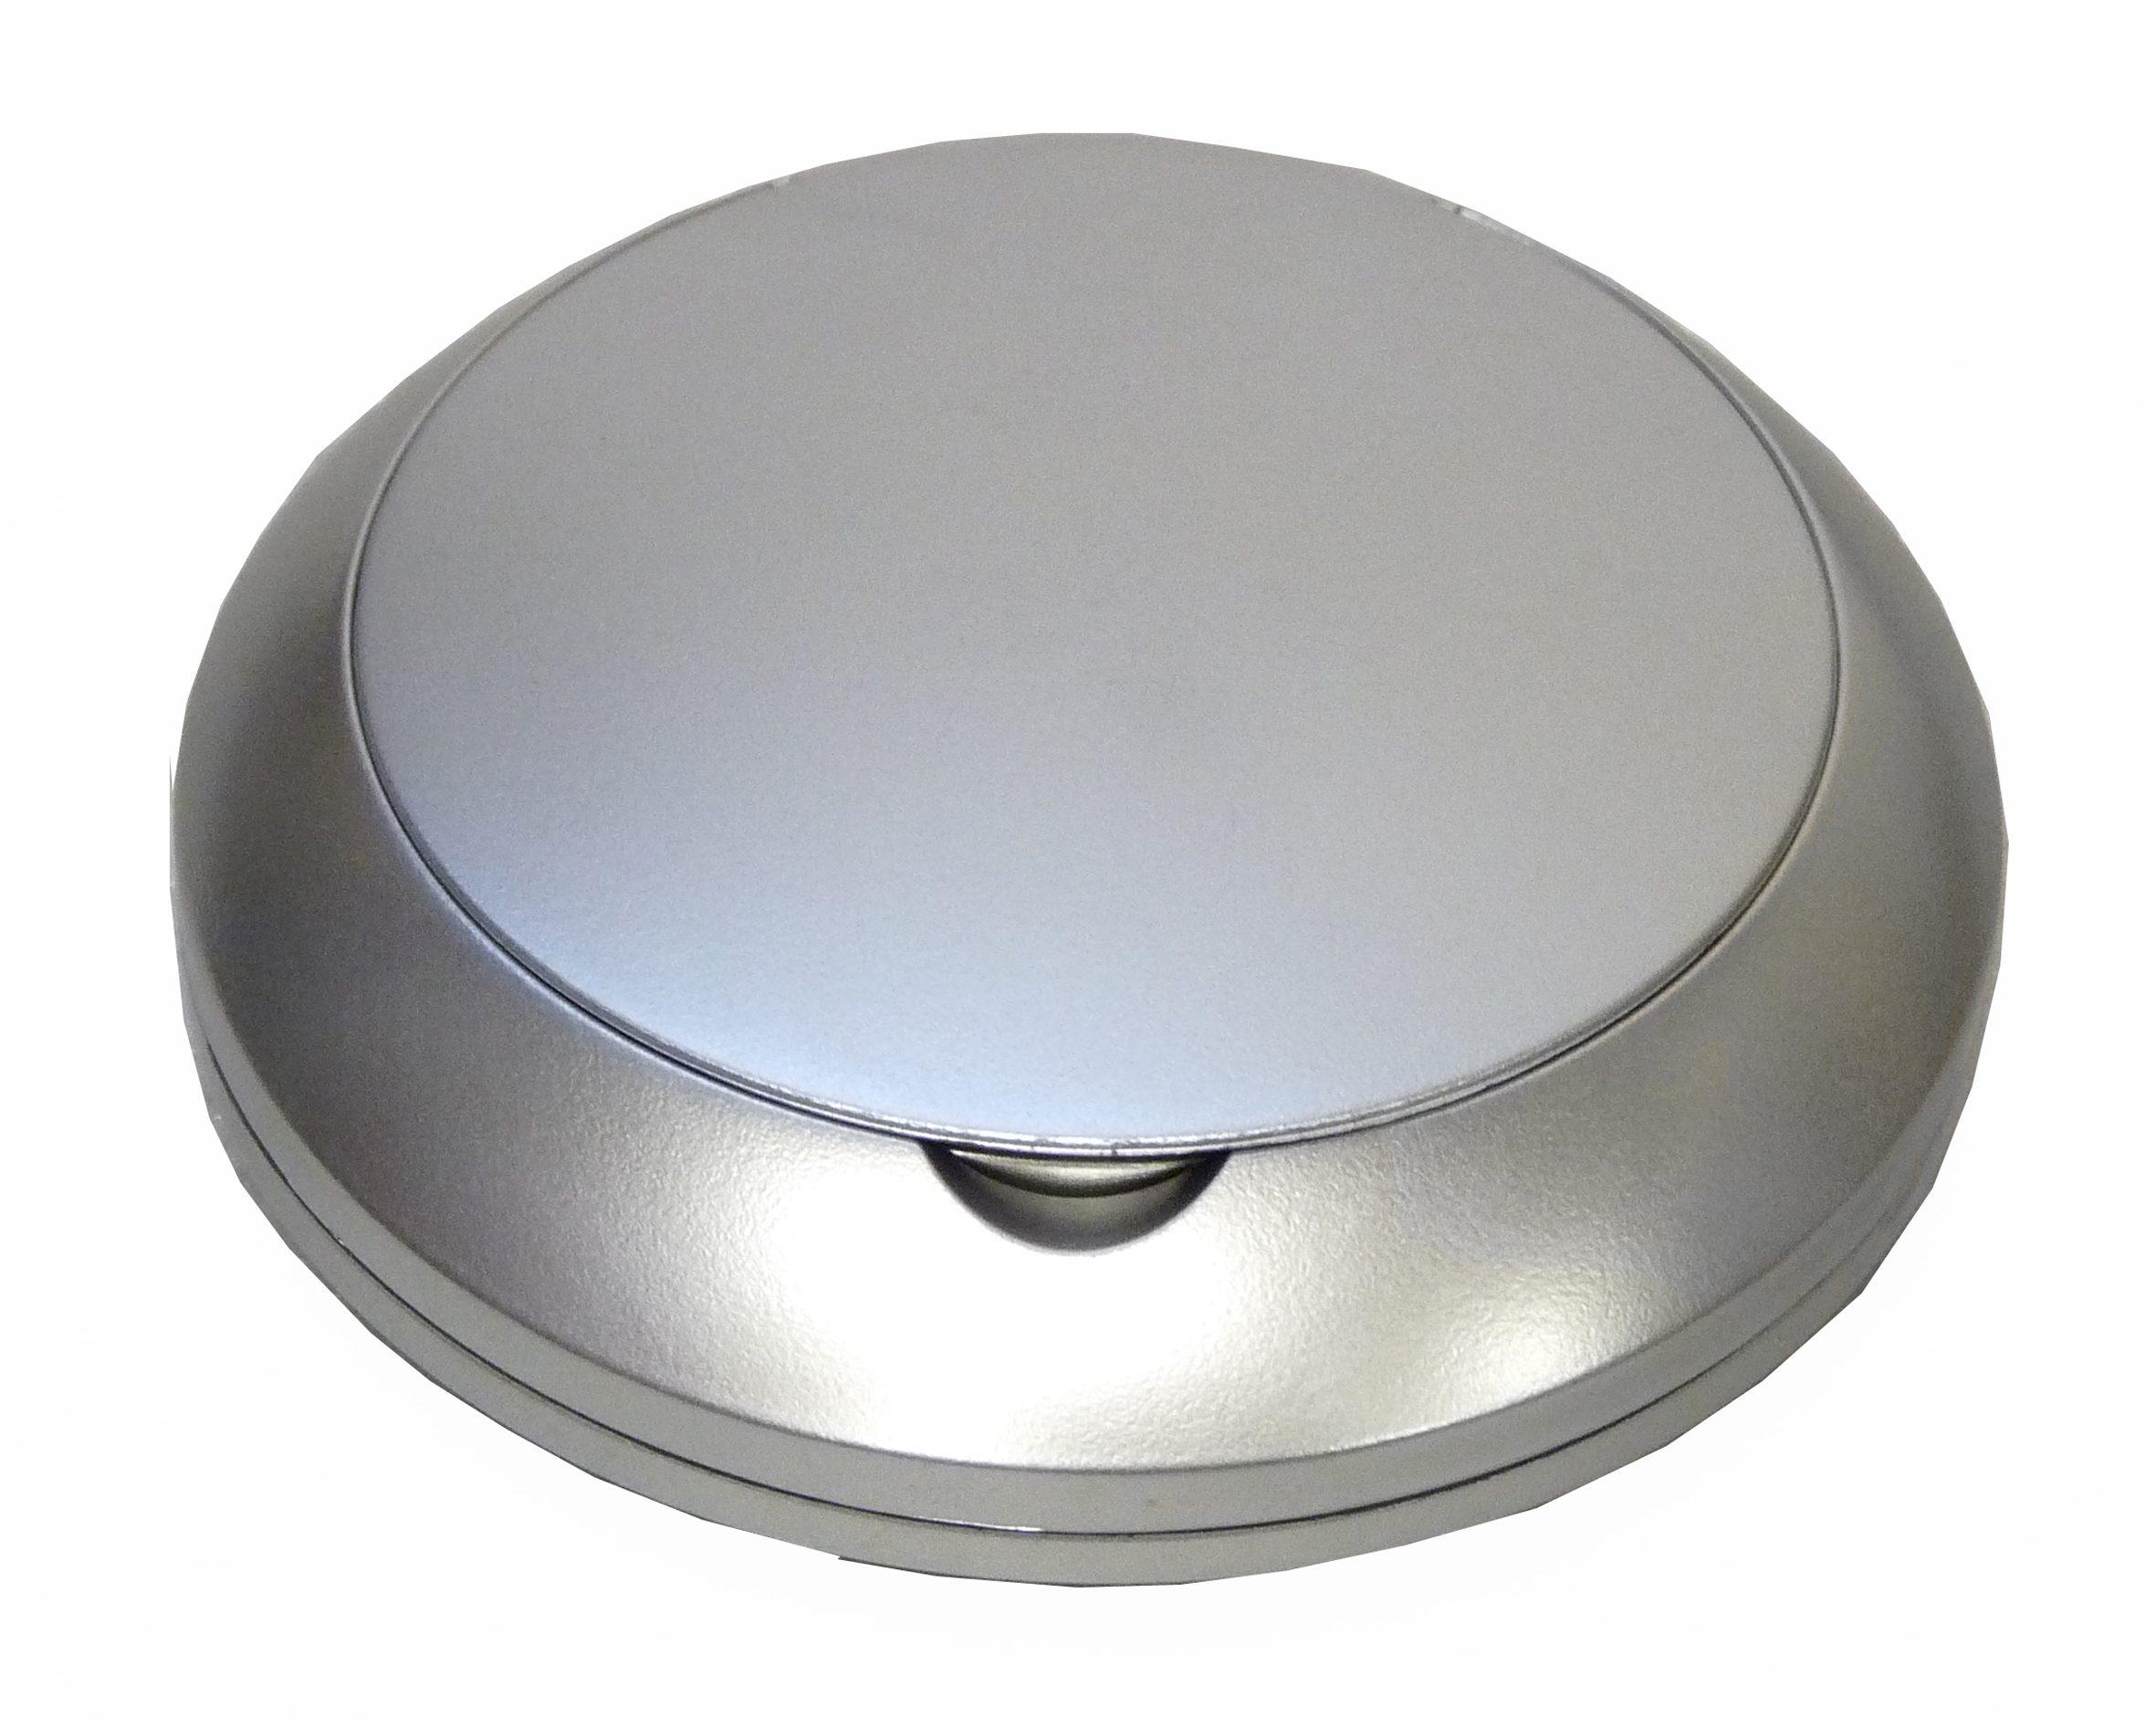 ... Digital traval alarm clock with vibrator